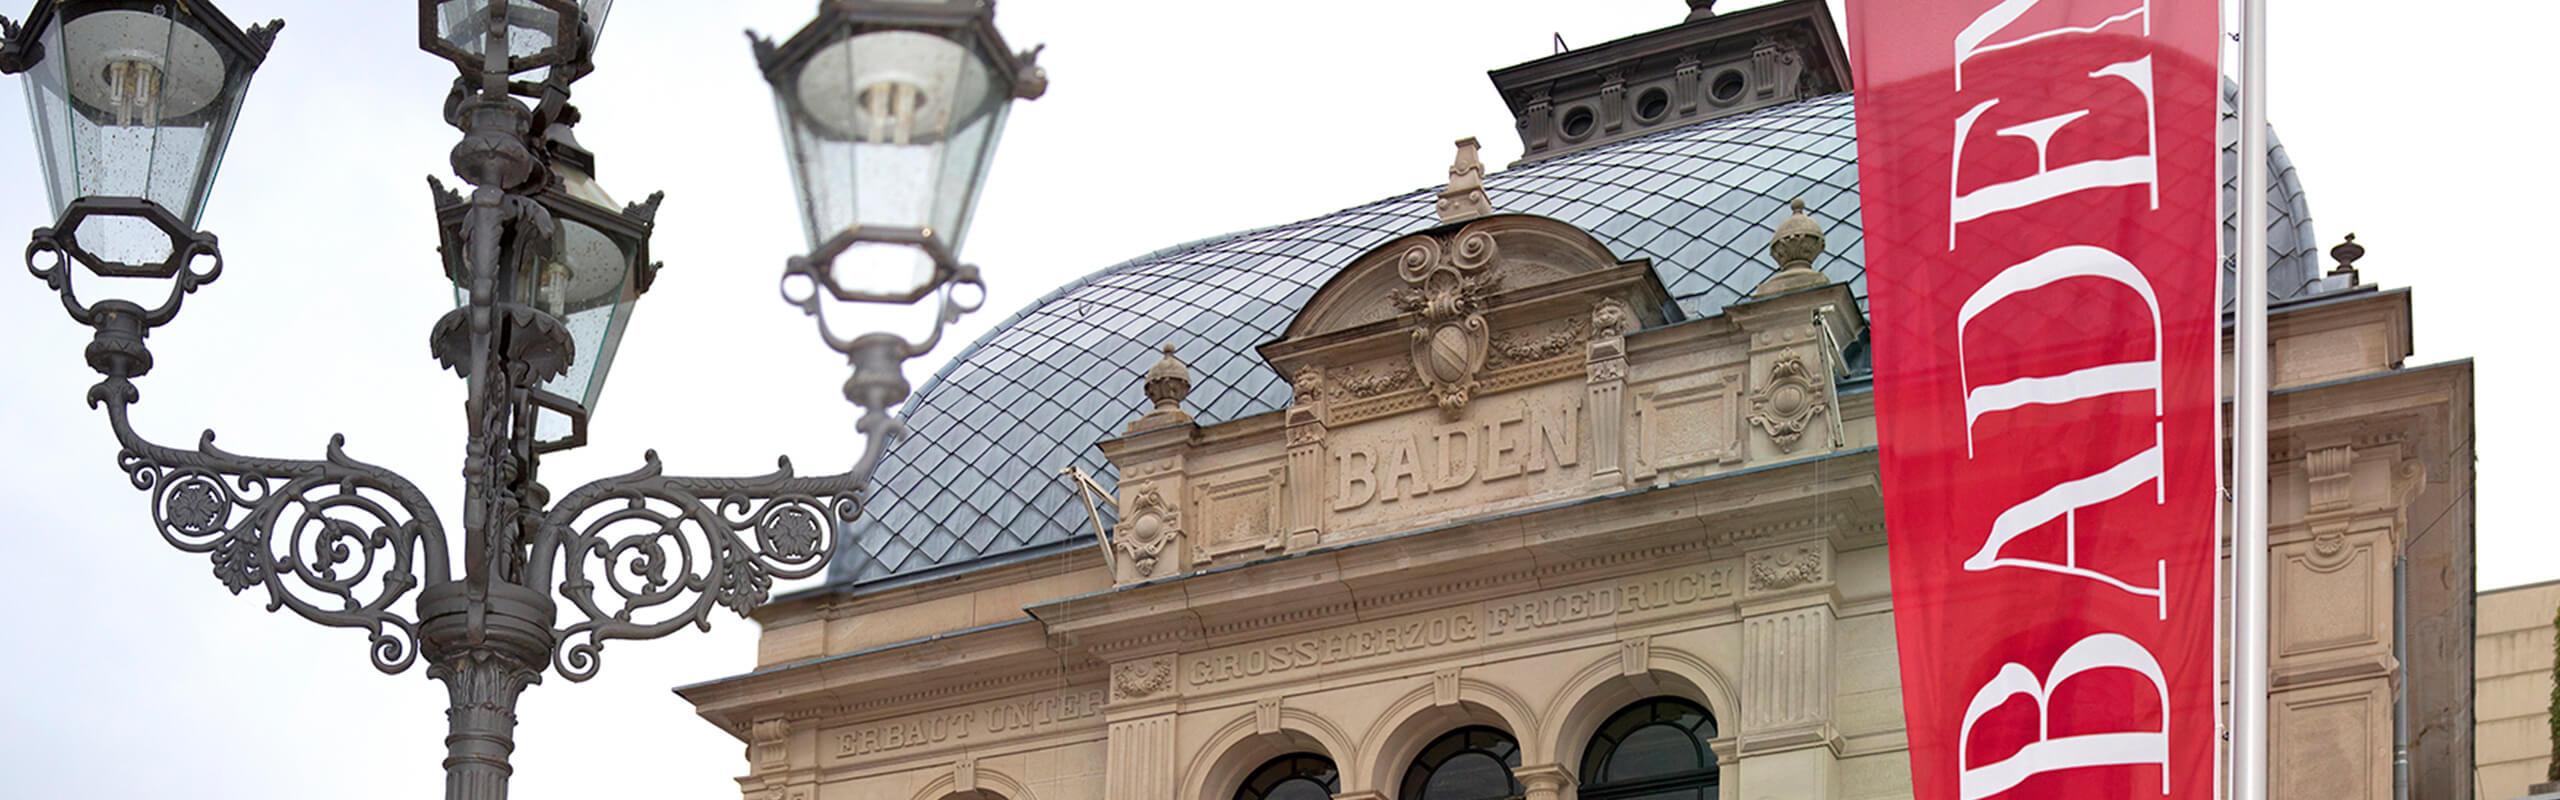 Roomers Baden Baden Behind the scenes Package